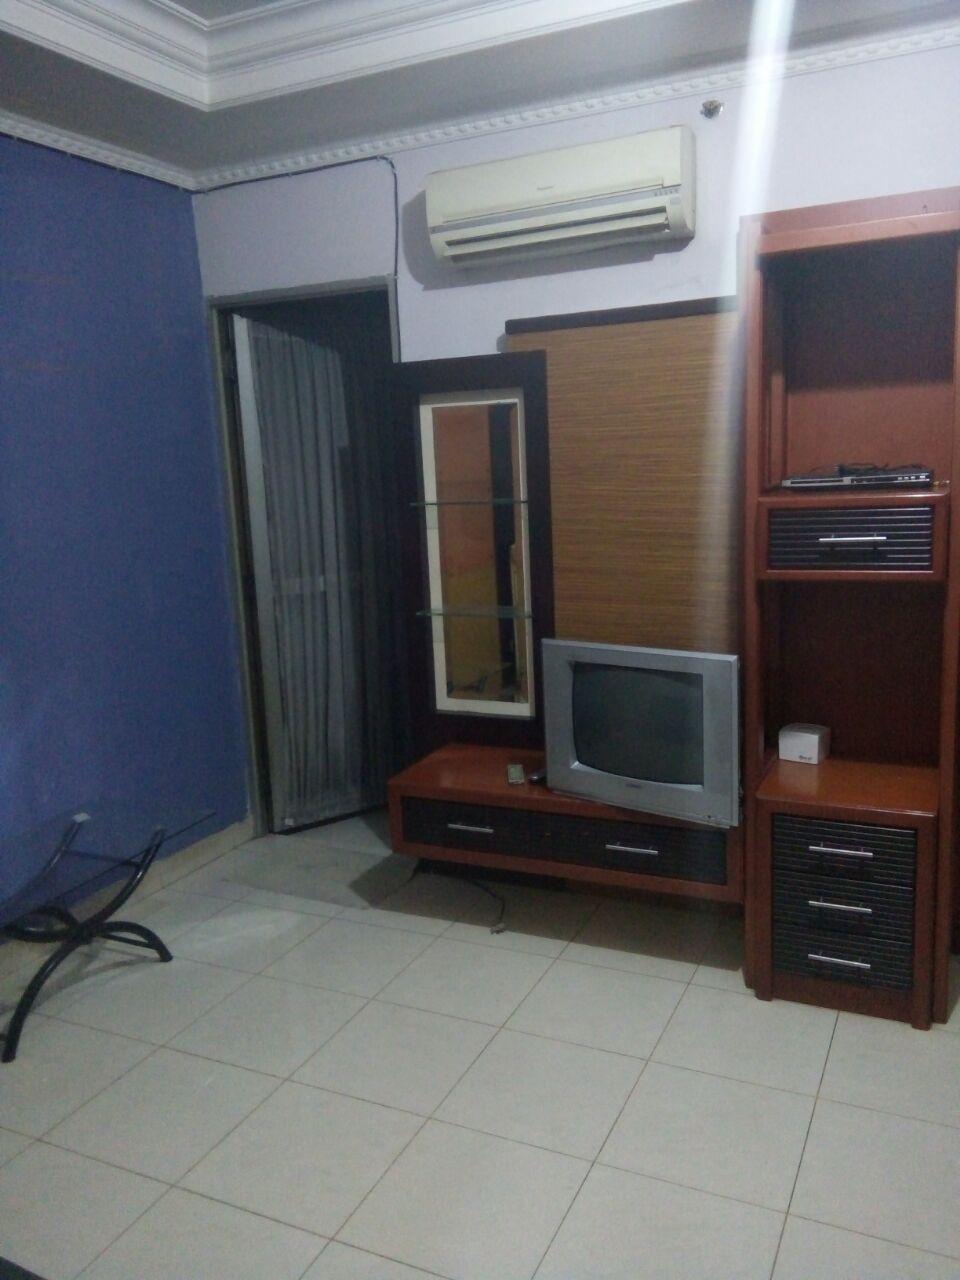 Price 2 BR Apartment Mediterania Gajah Mada - Room 13